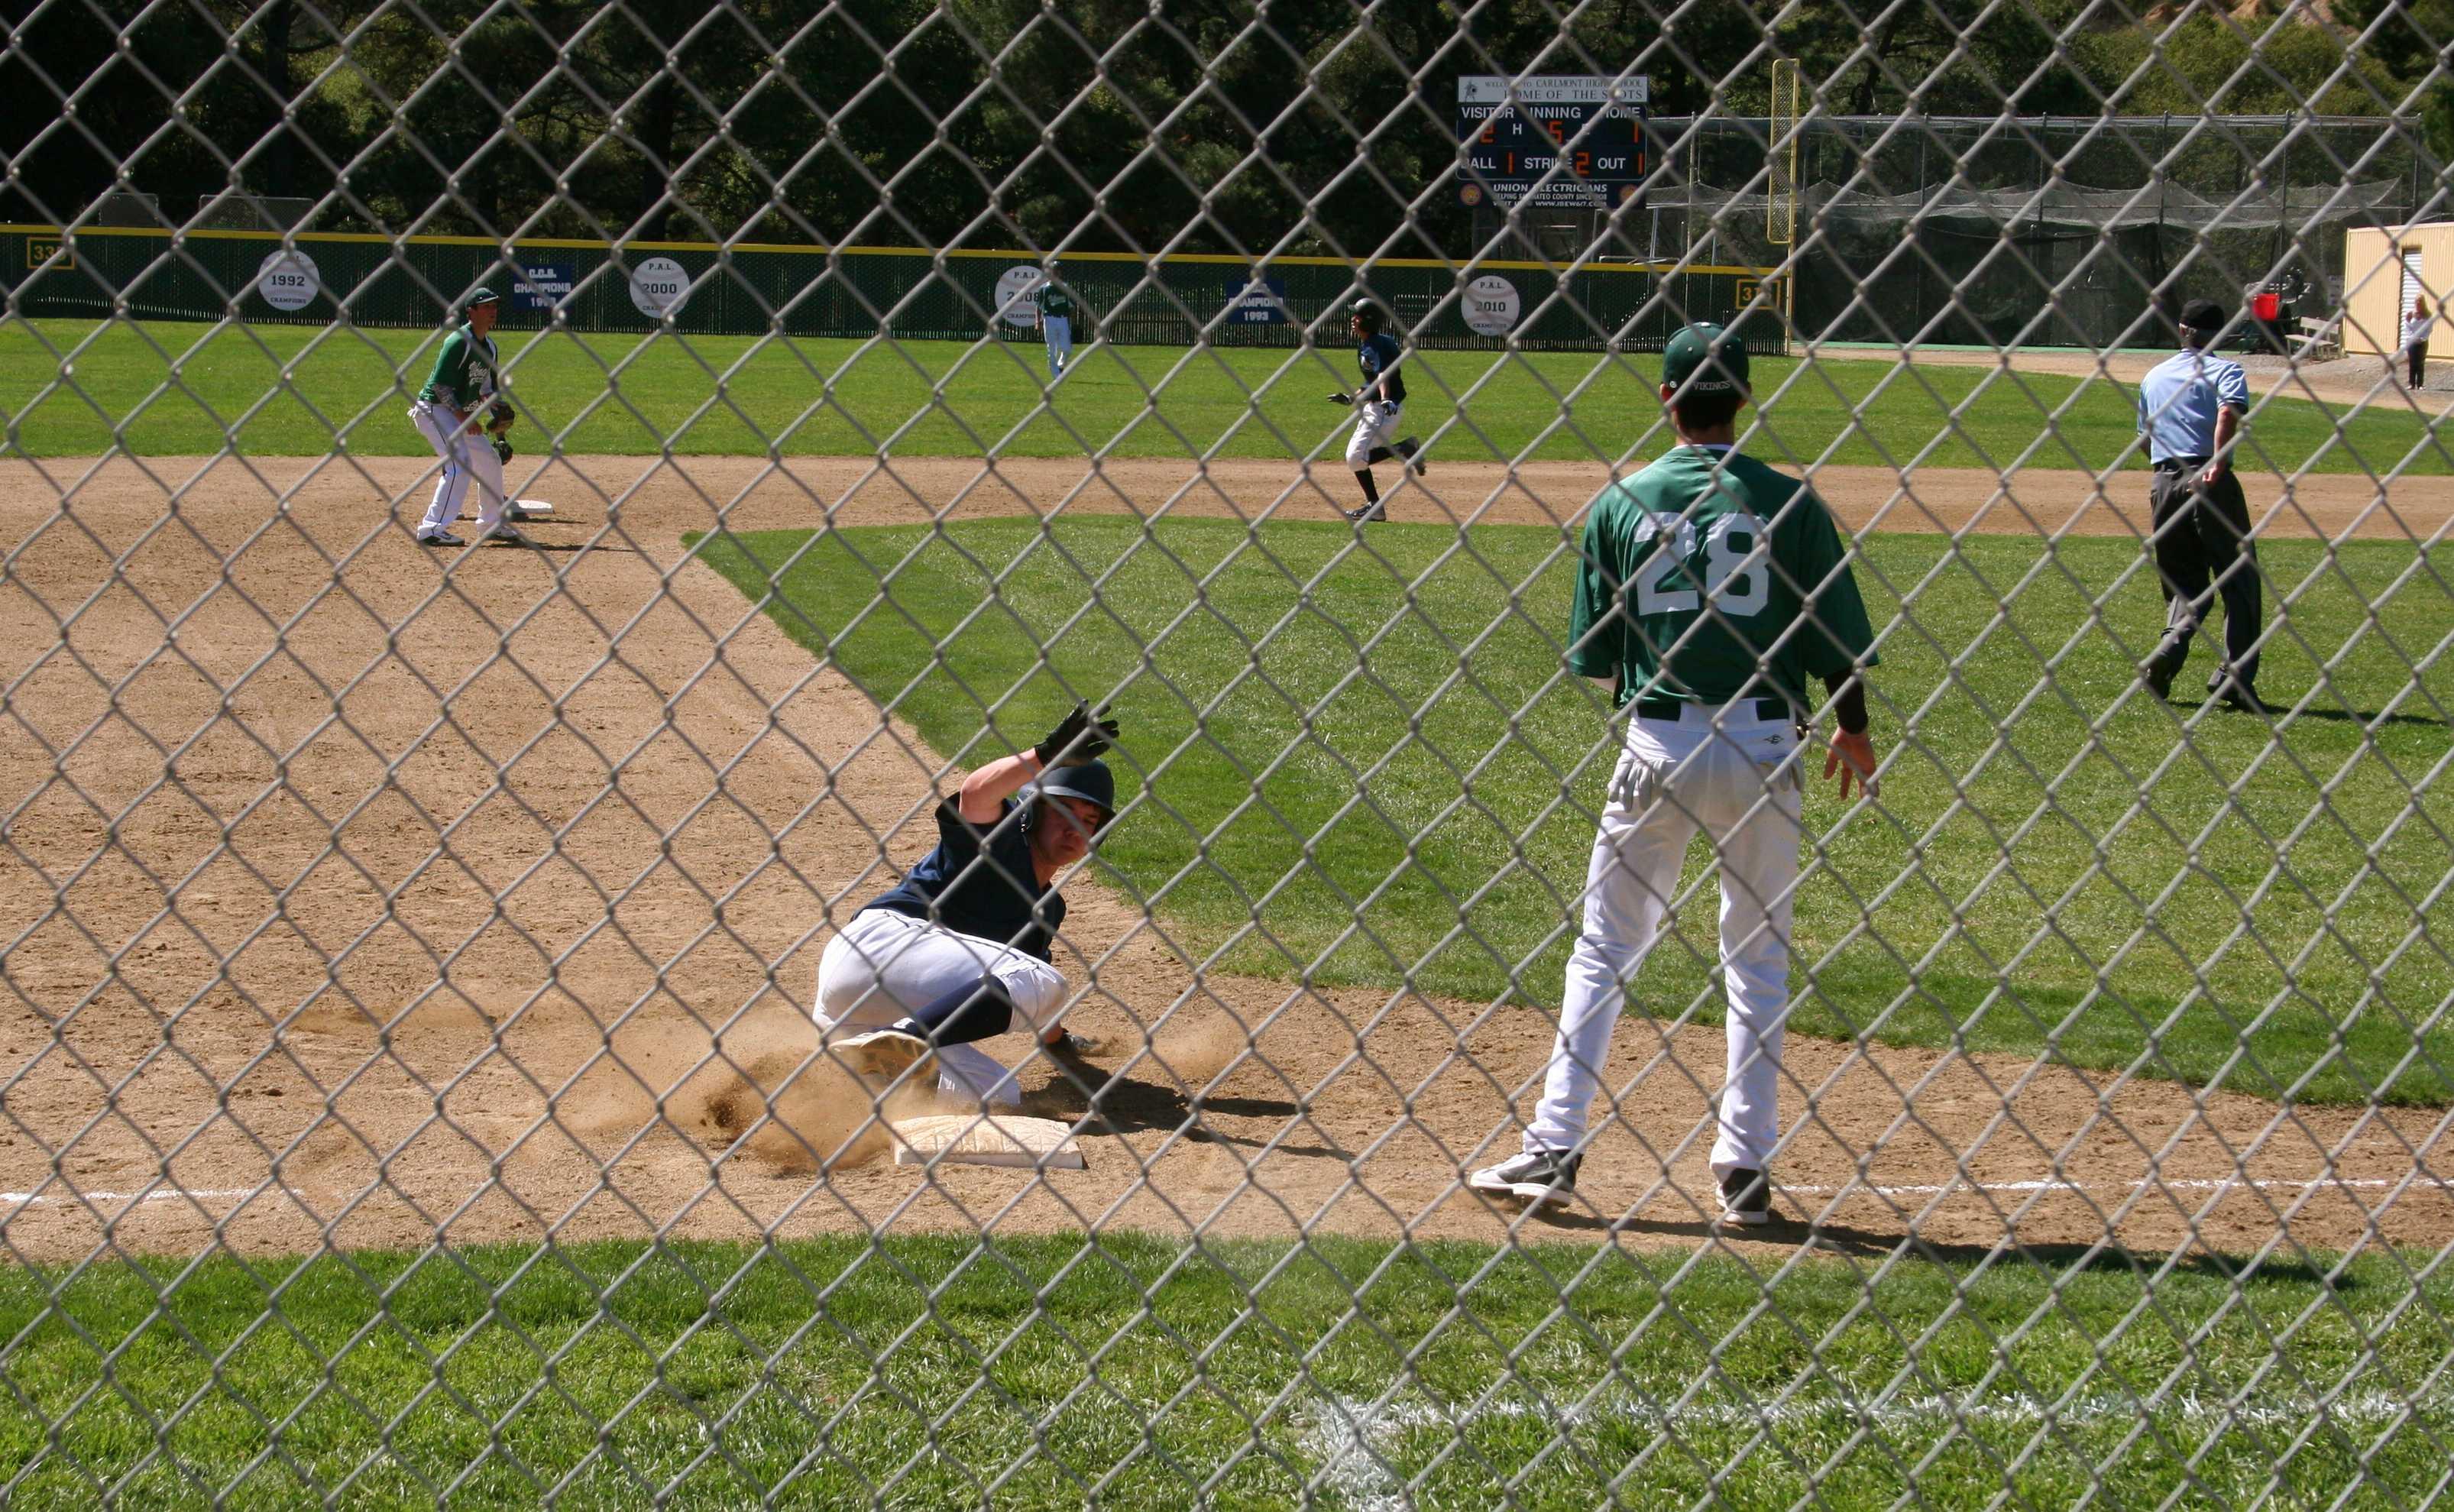 Third baseman Michael McGill steals third base.